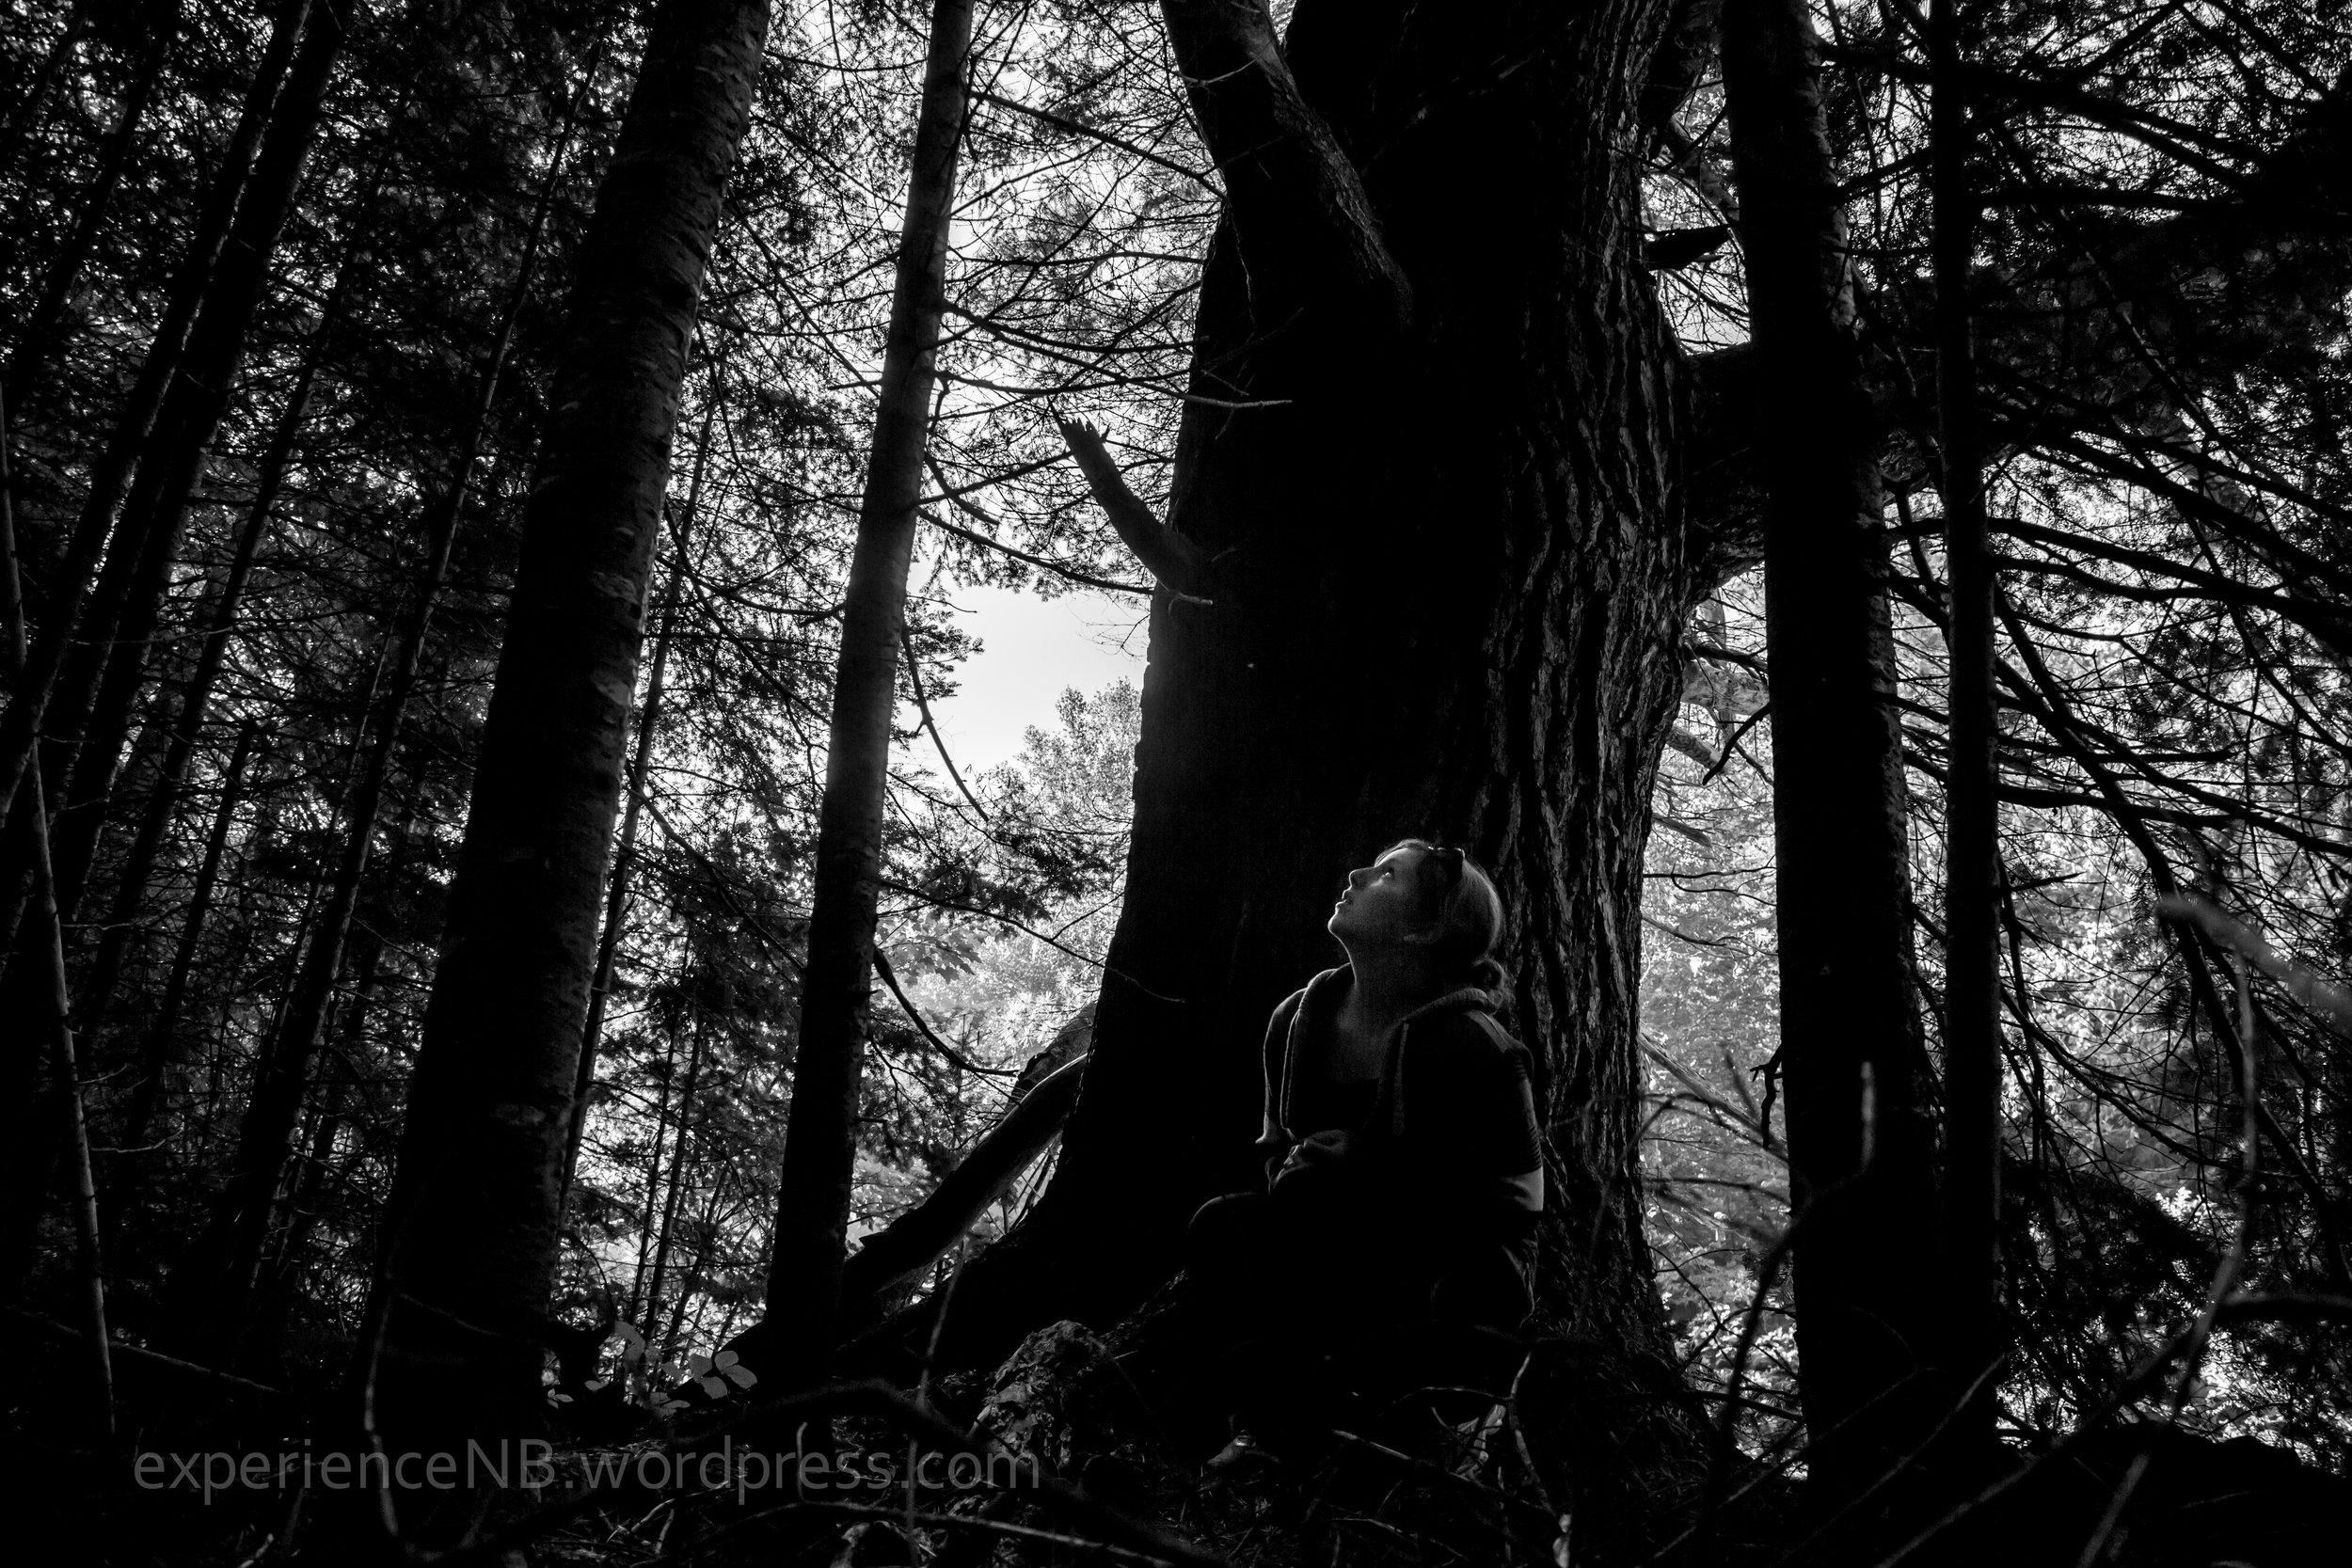 TreeHouseCamping_Miramichi_Aug29-31.2013-59.jpg